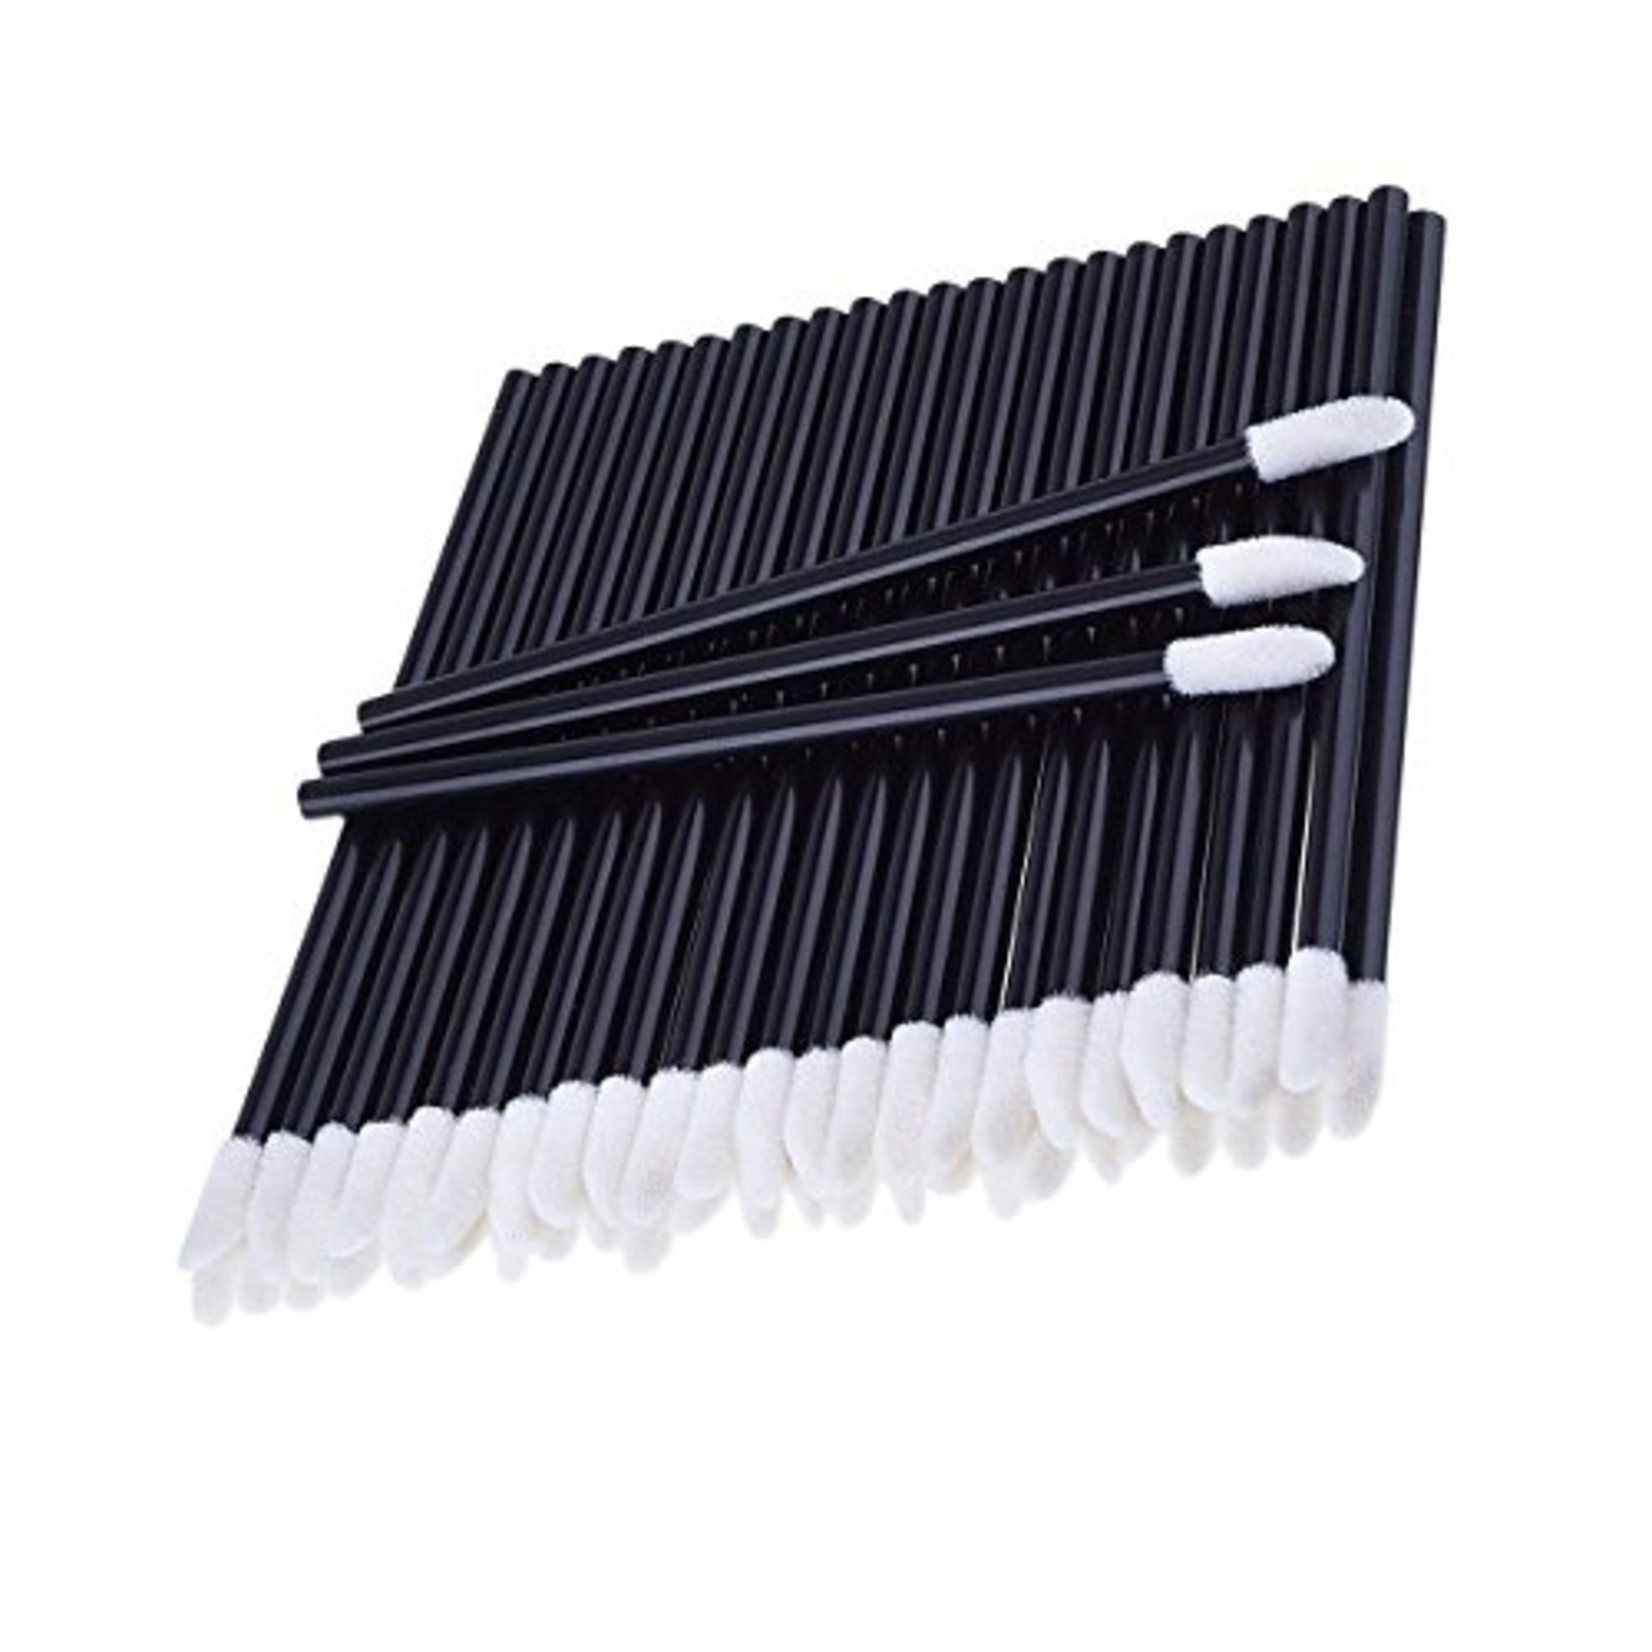 Browguru® Lipgloss Applicator Black 50 Pieces